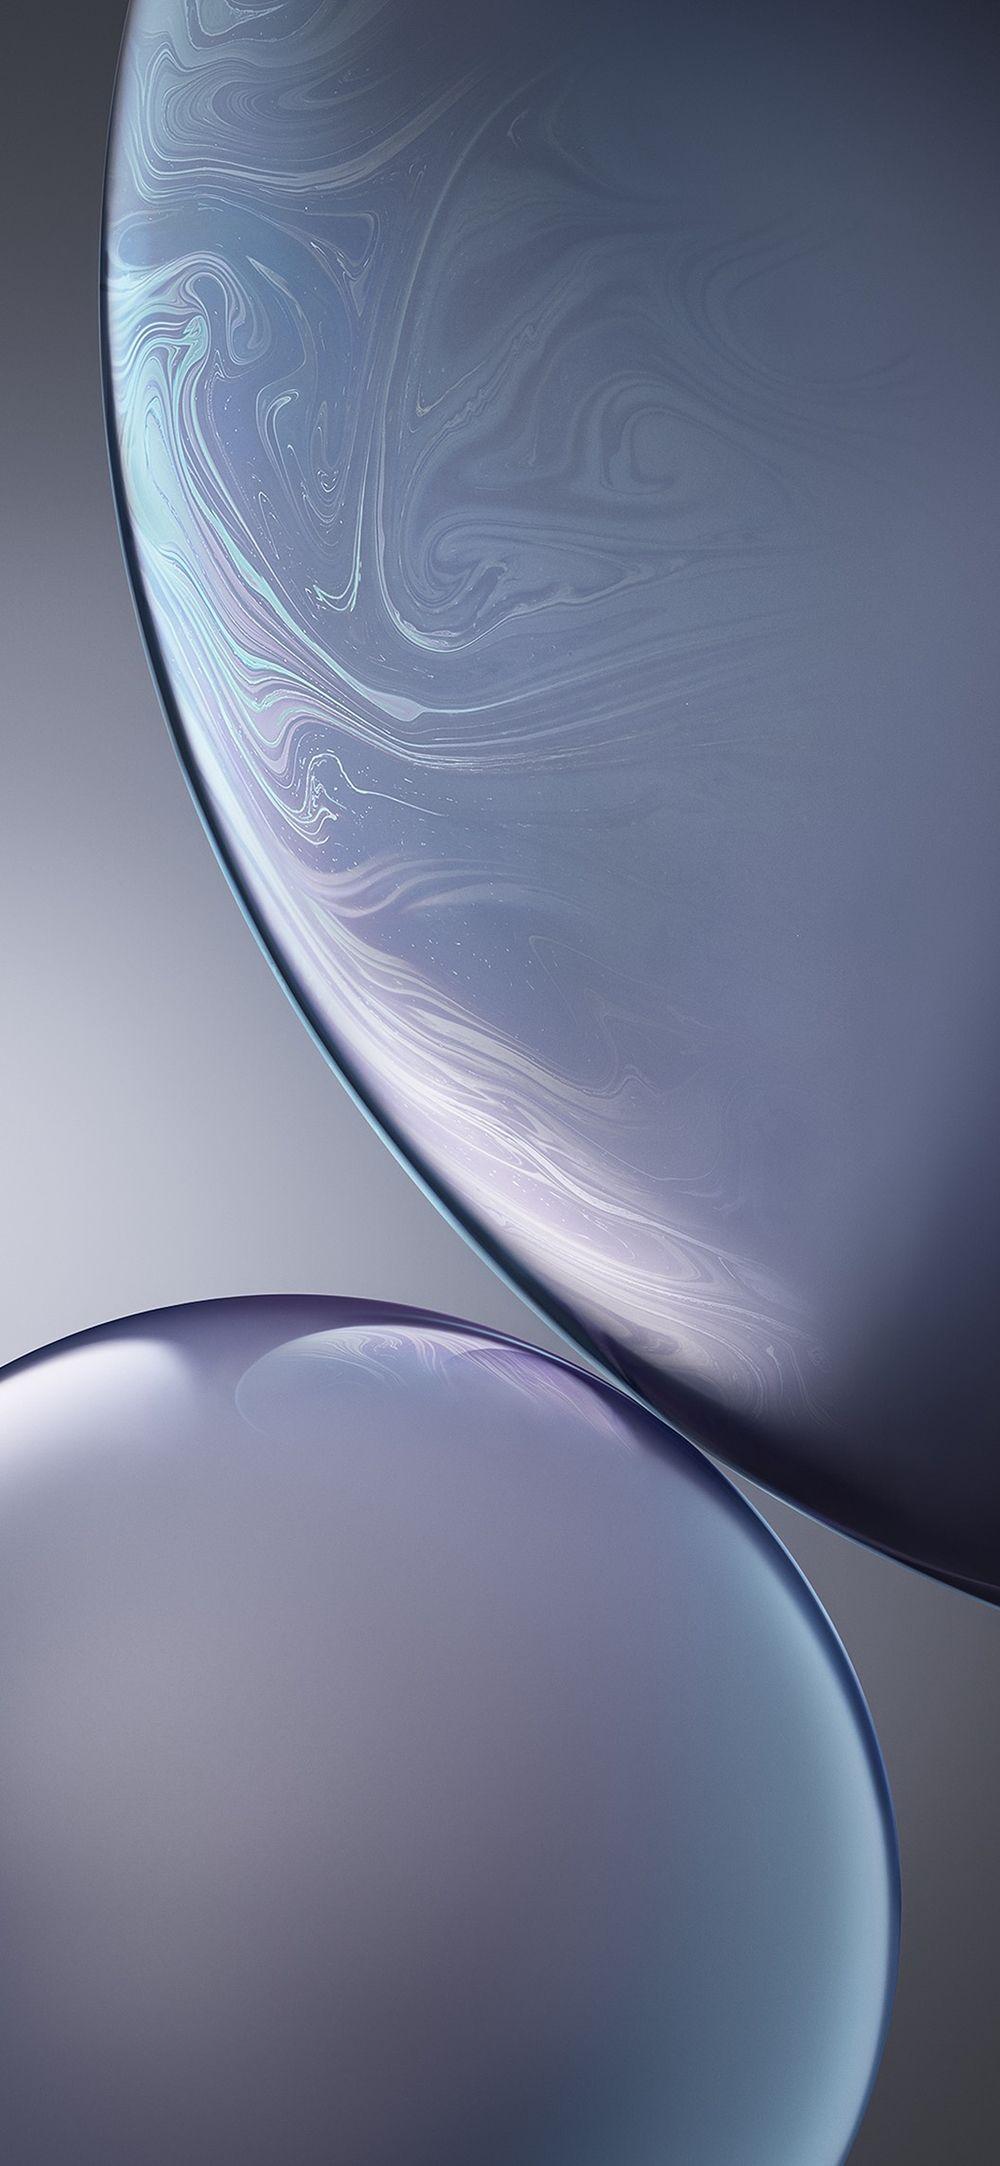 Papel De Parede De Iphone Xr Apple Wallpaper Iphone Apple Wallpaper Iphone Wallpaper Ios